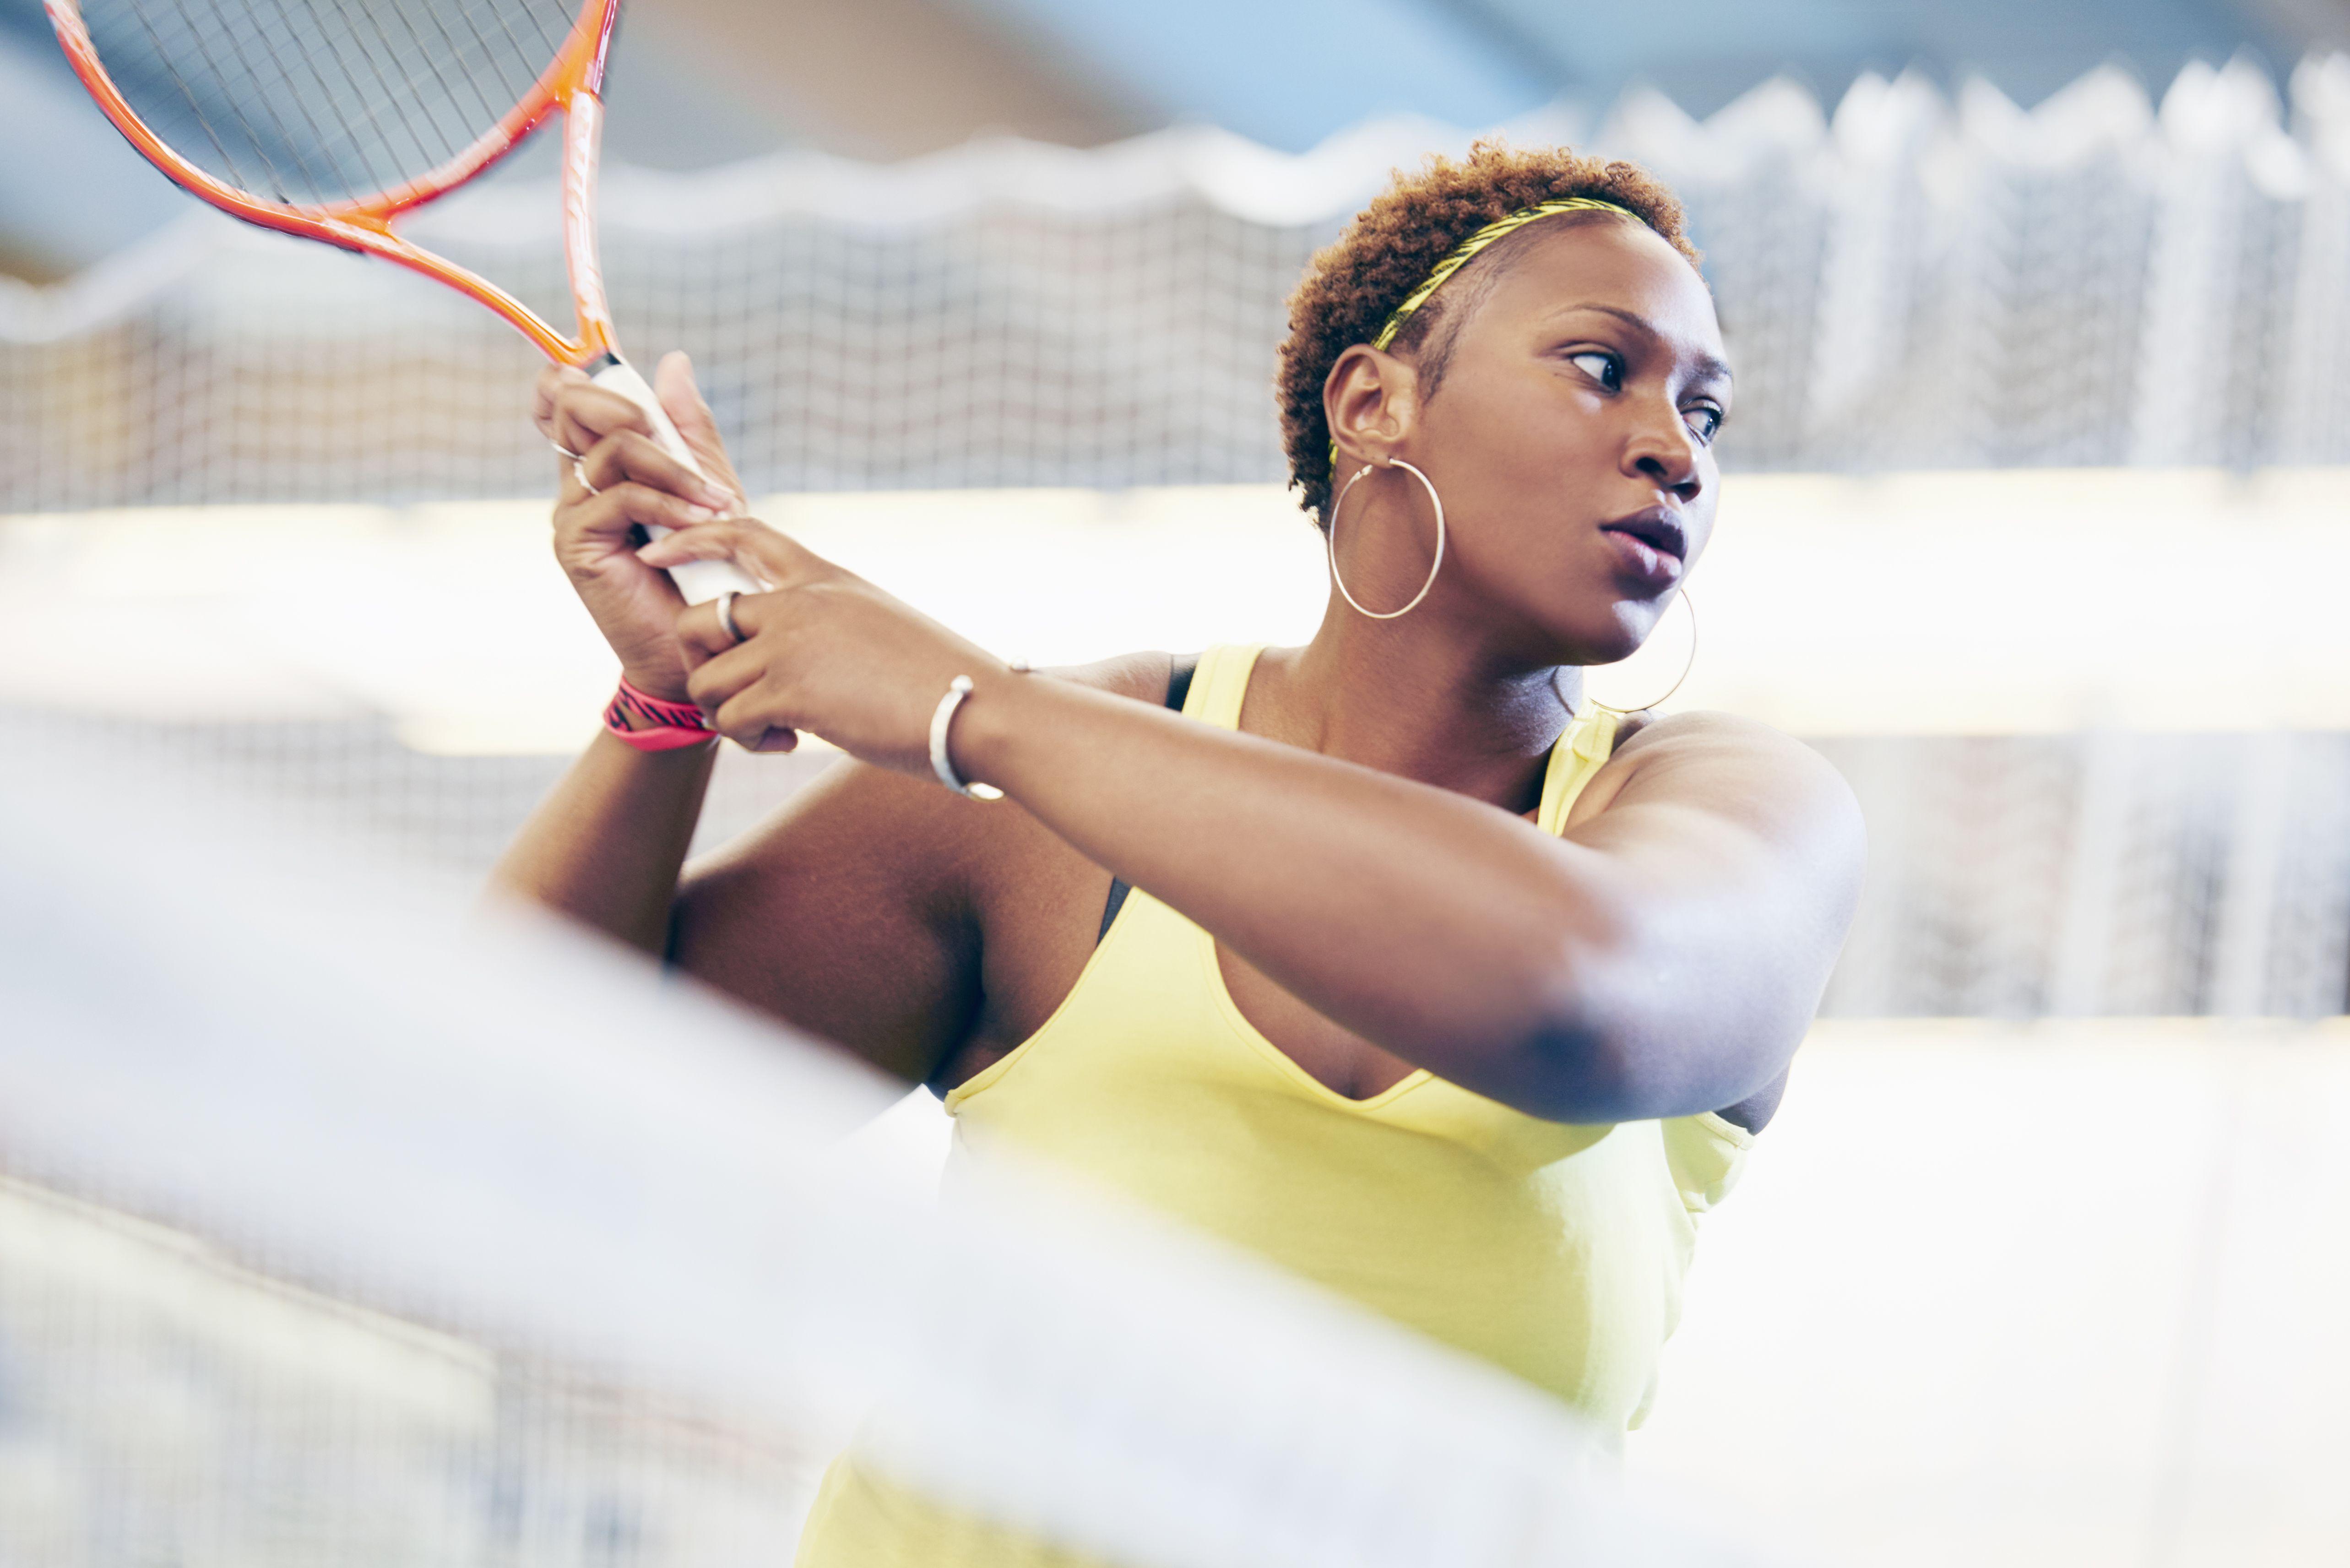 Sports woman on tennis court swinging racket